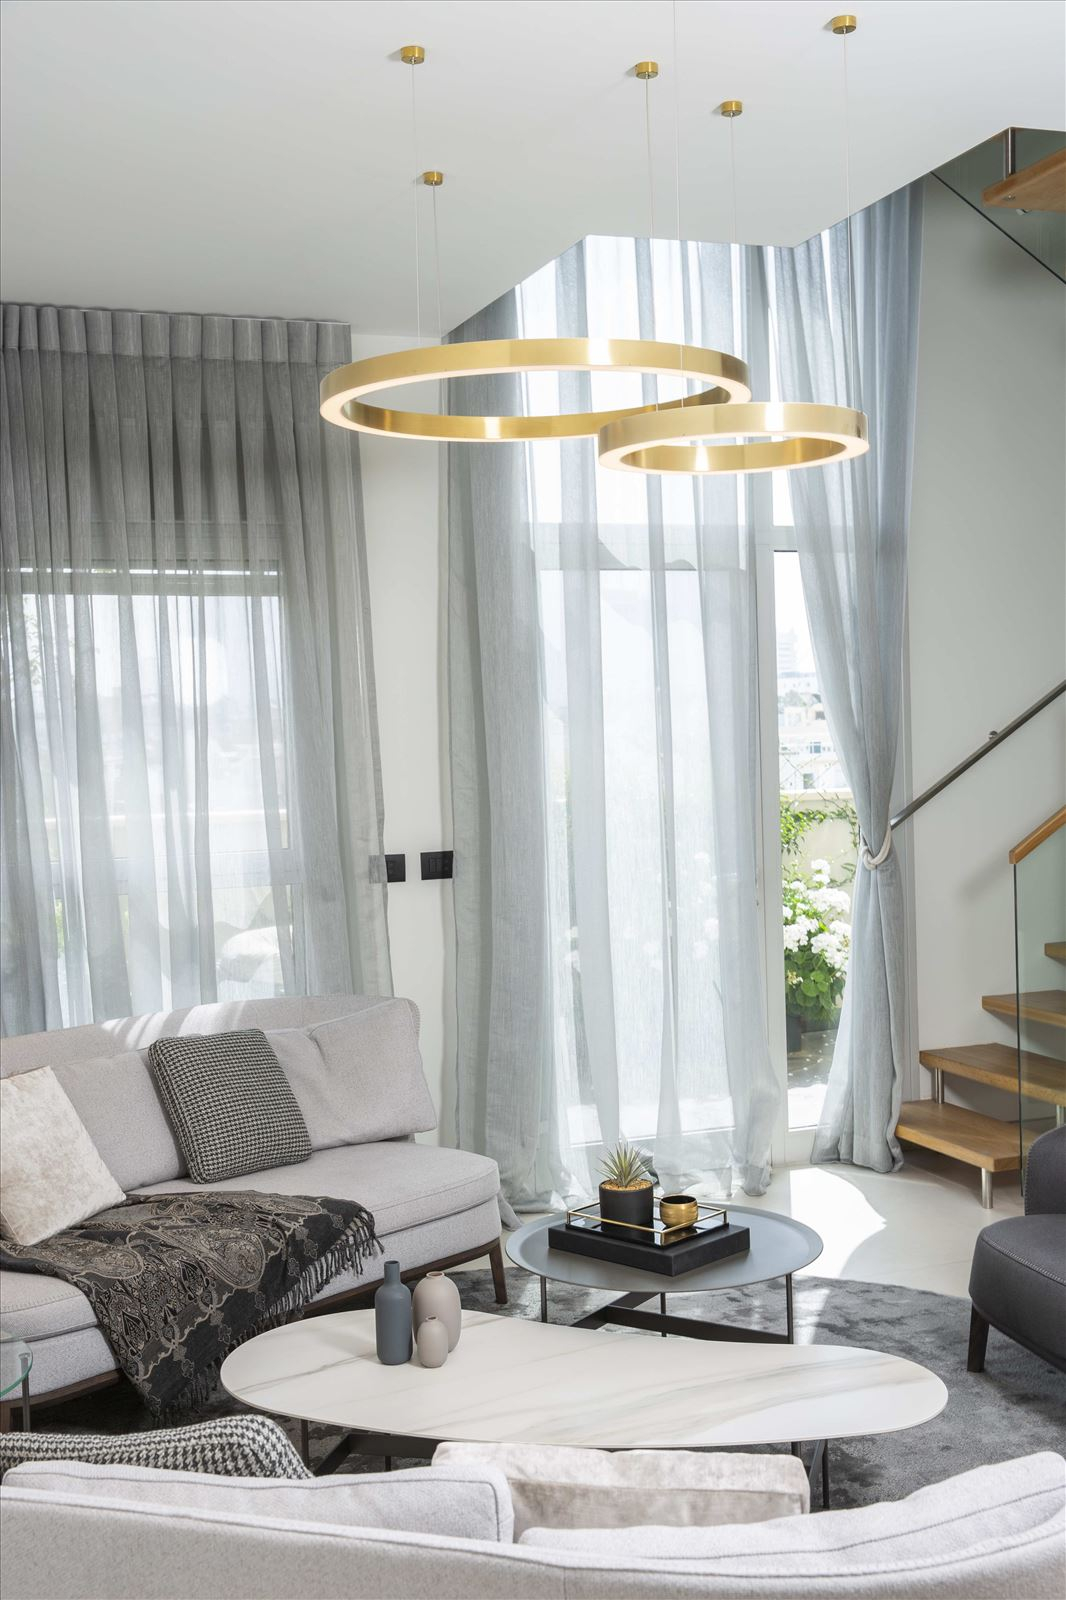 Tel Aviv apartment in Parisian aroma תאורת תקרה בסלון מבית דורי קמחי